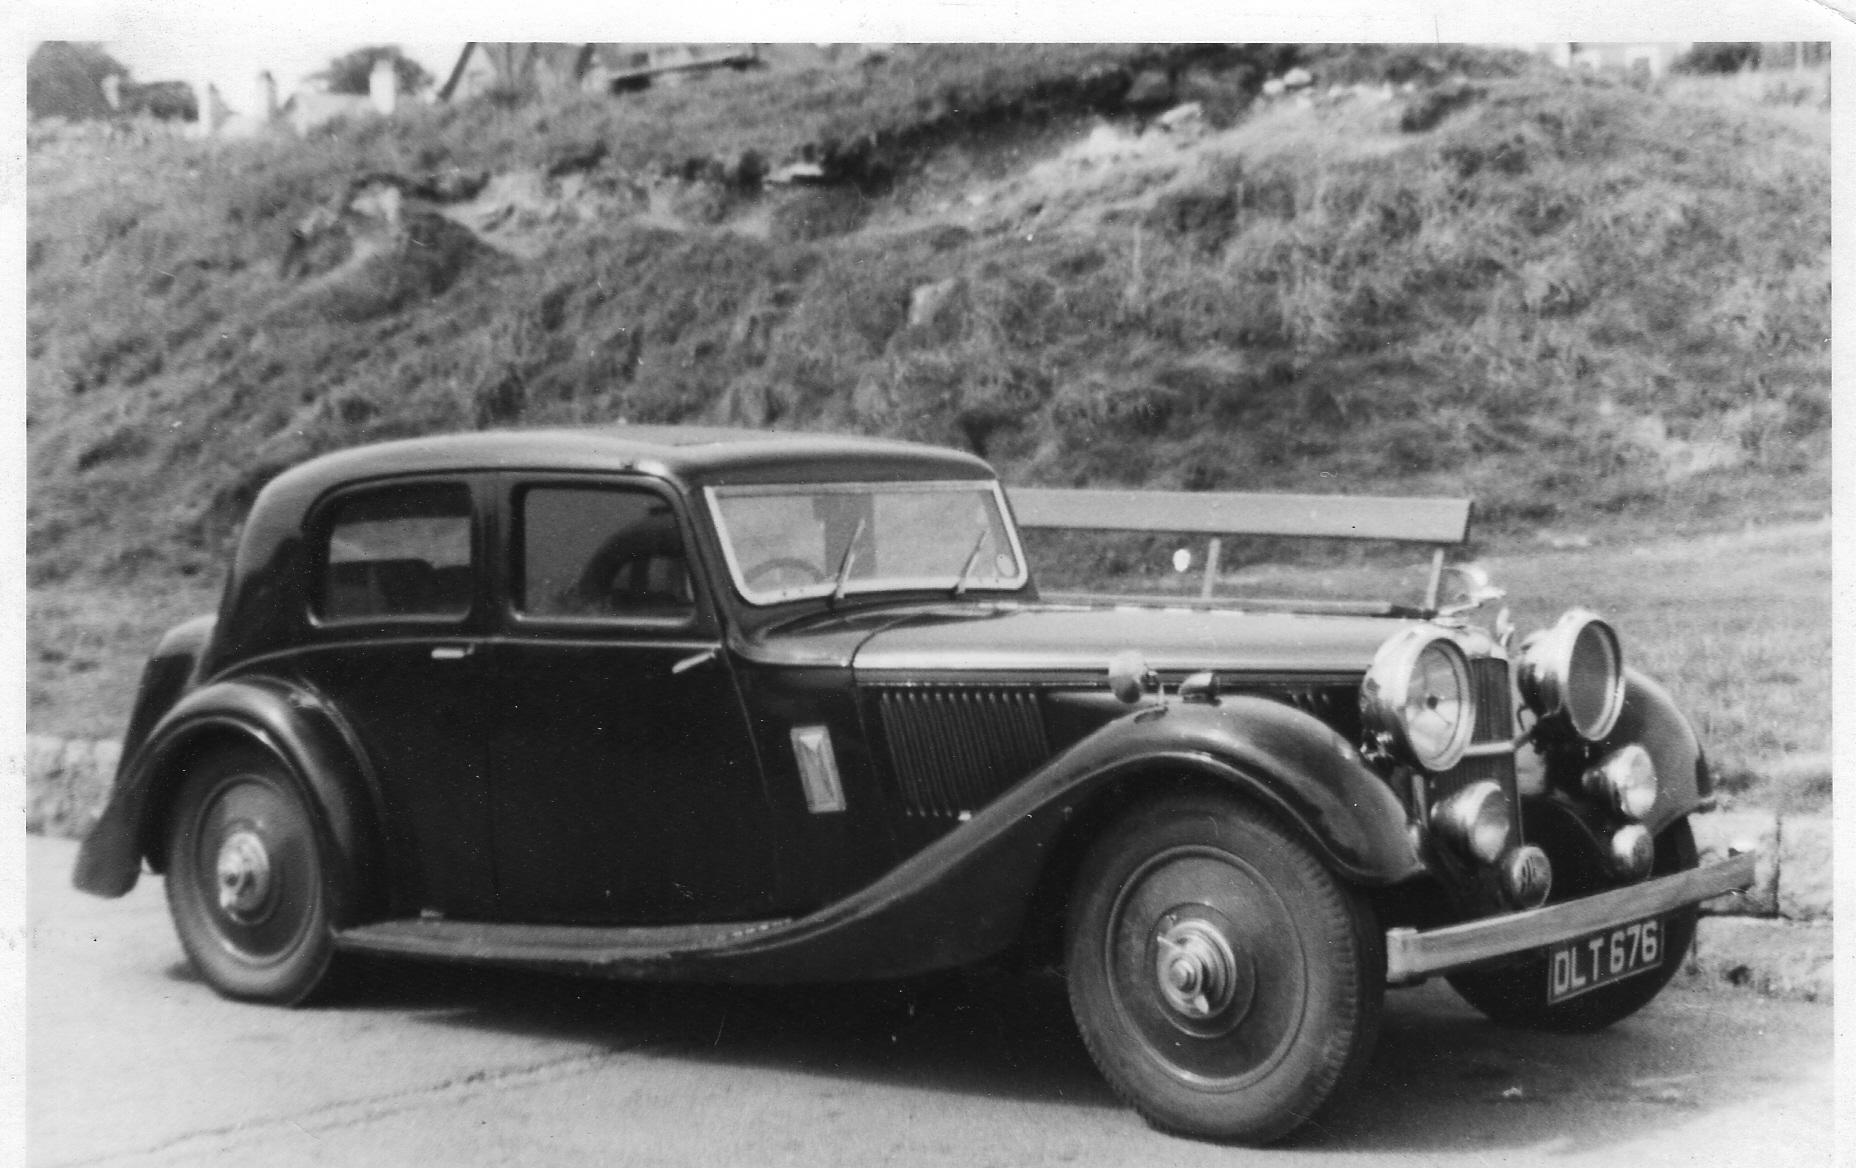 DLT 576 1936 Speed 25 SB Lancefield (all al) extending boot ch13329 car 13609